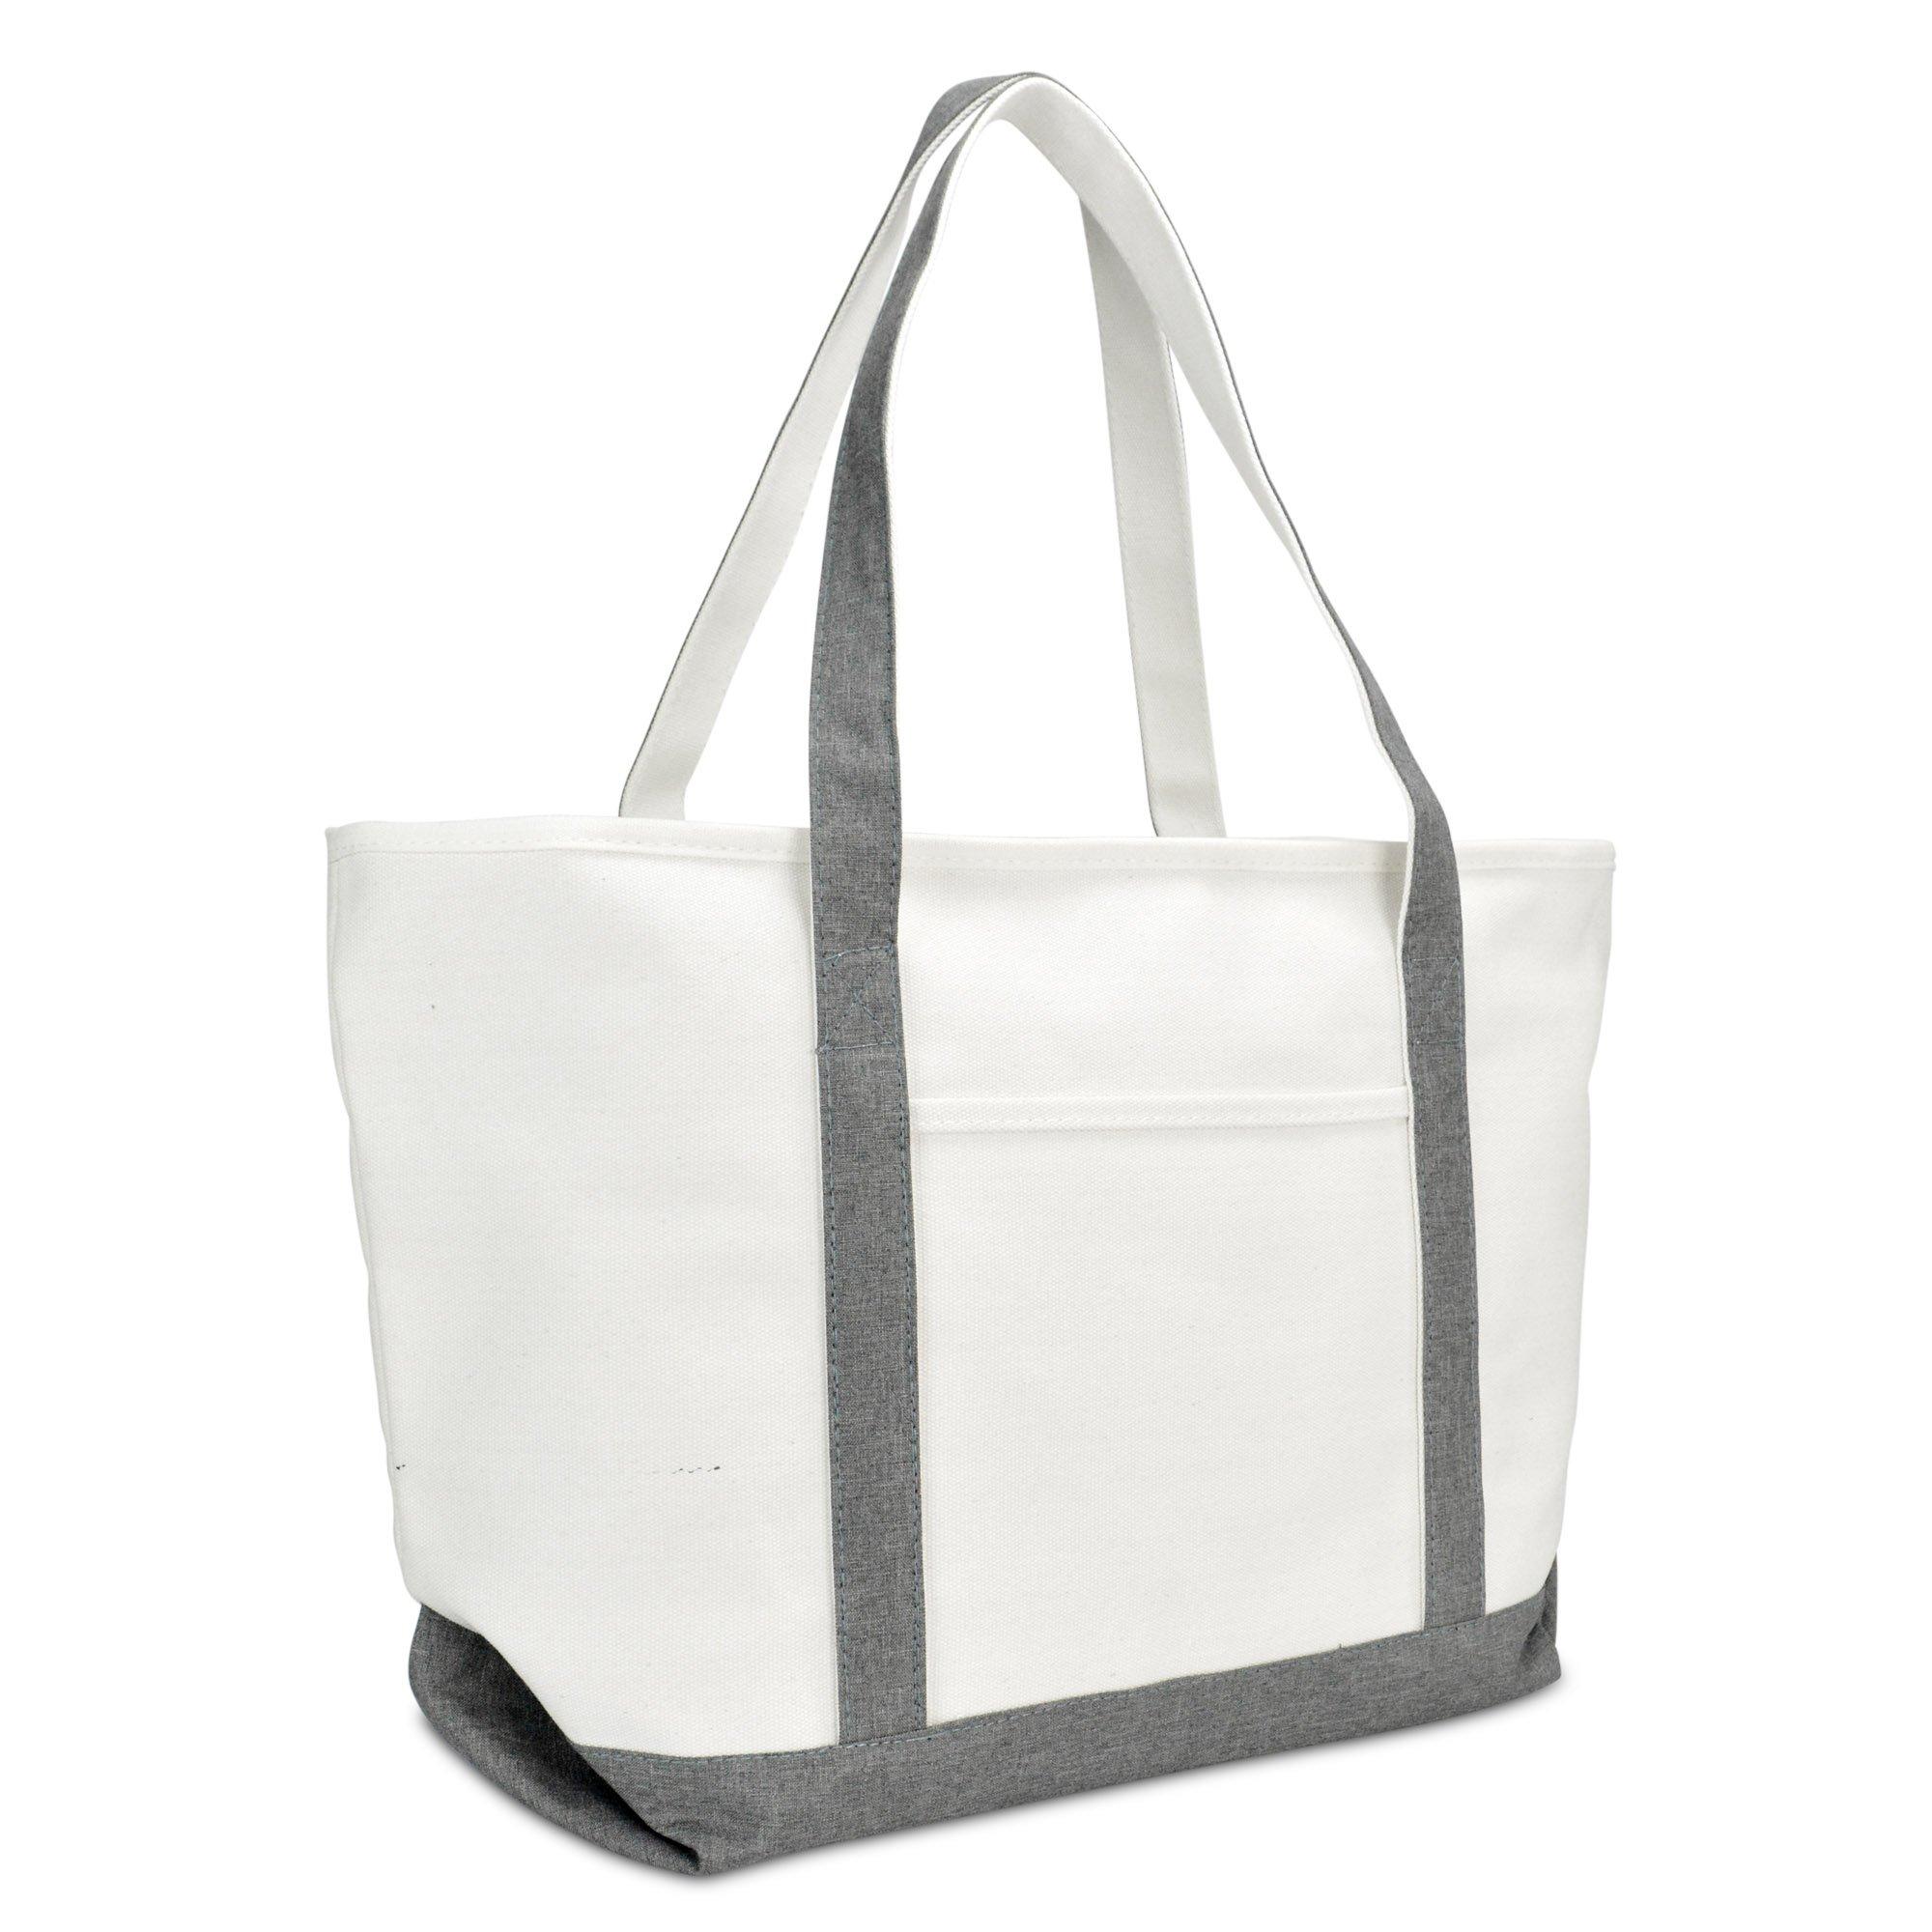 DALIX 23'' Premium 24 oz. Cotton Canvas Shopping Tote Bag (Gray)